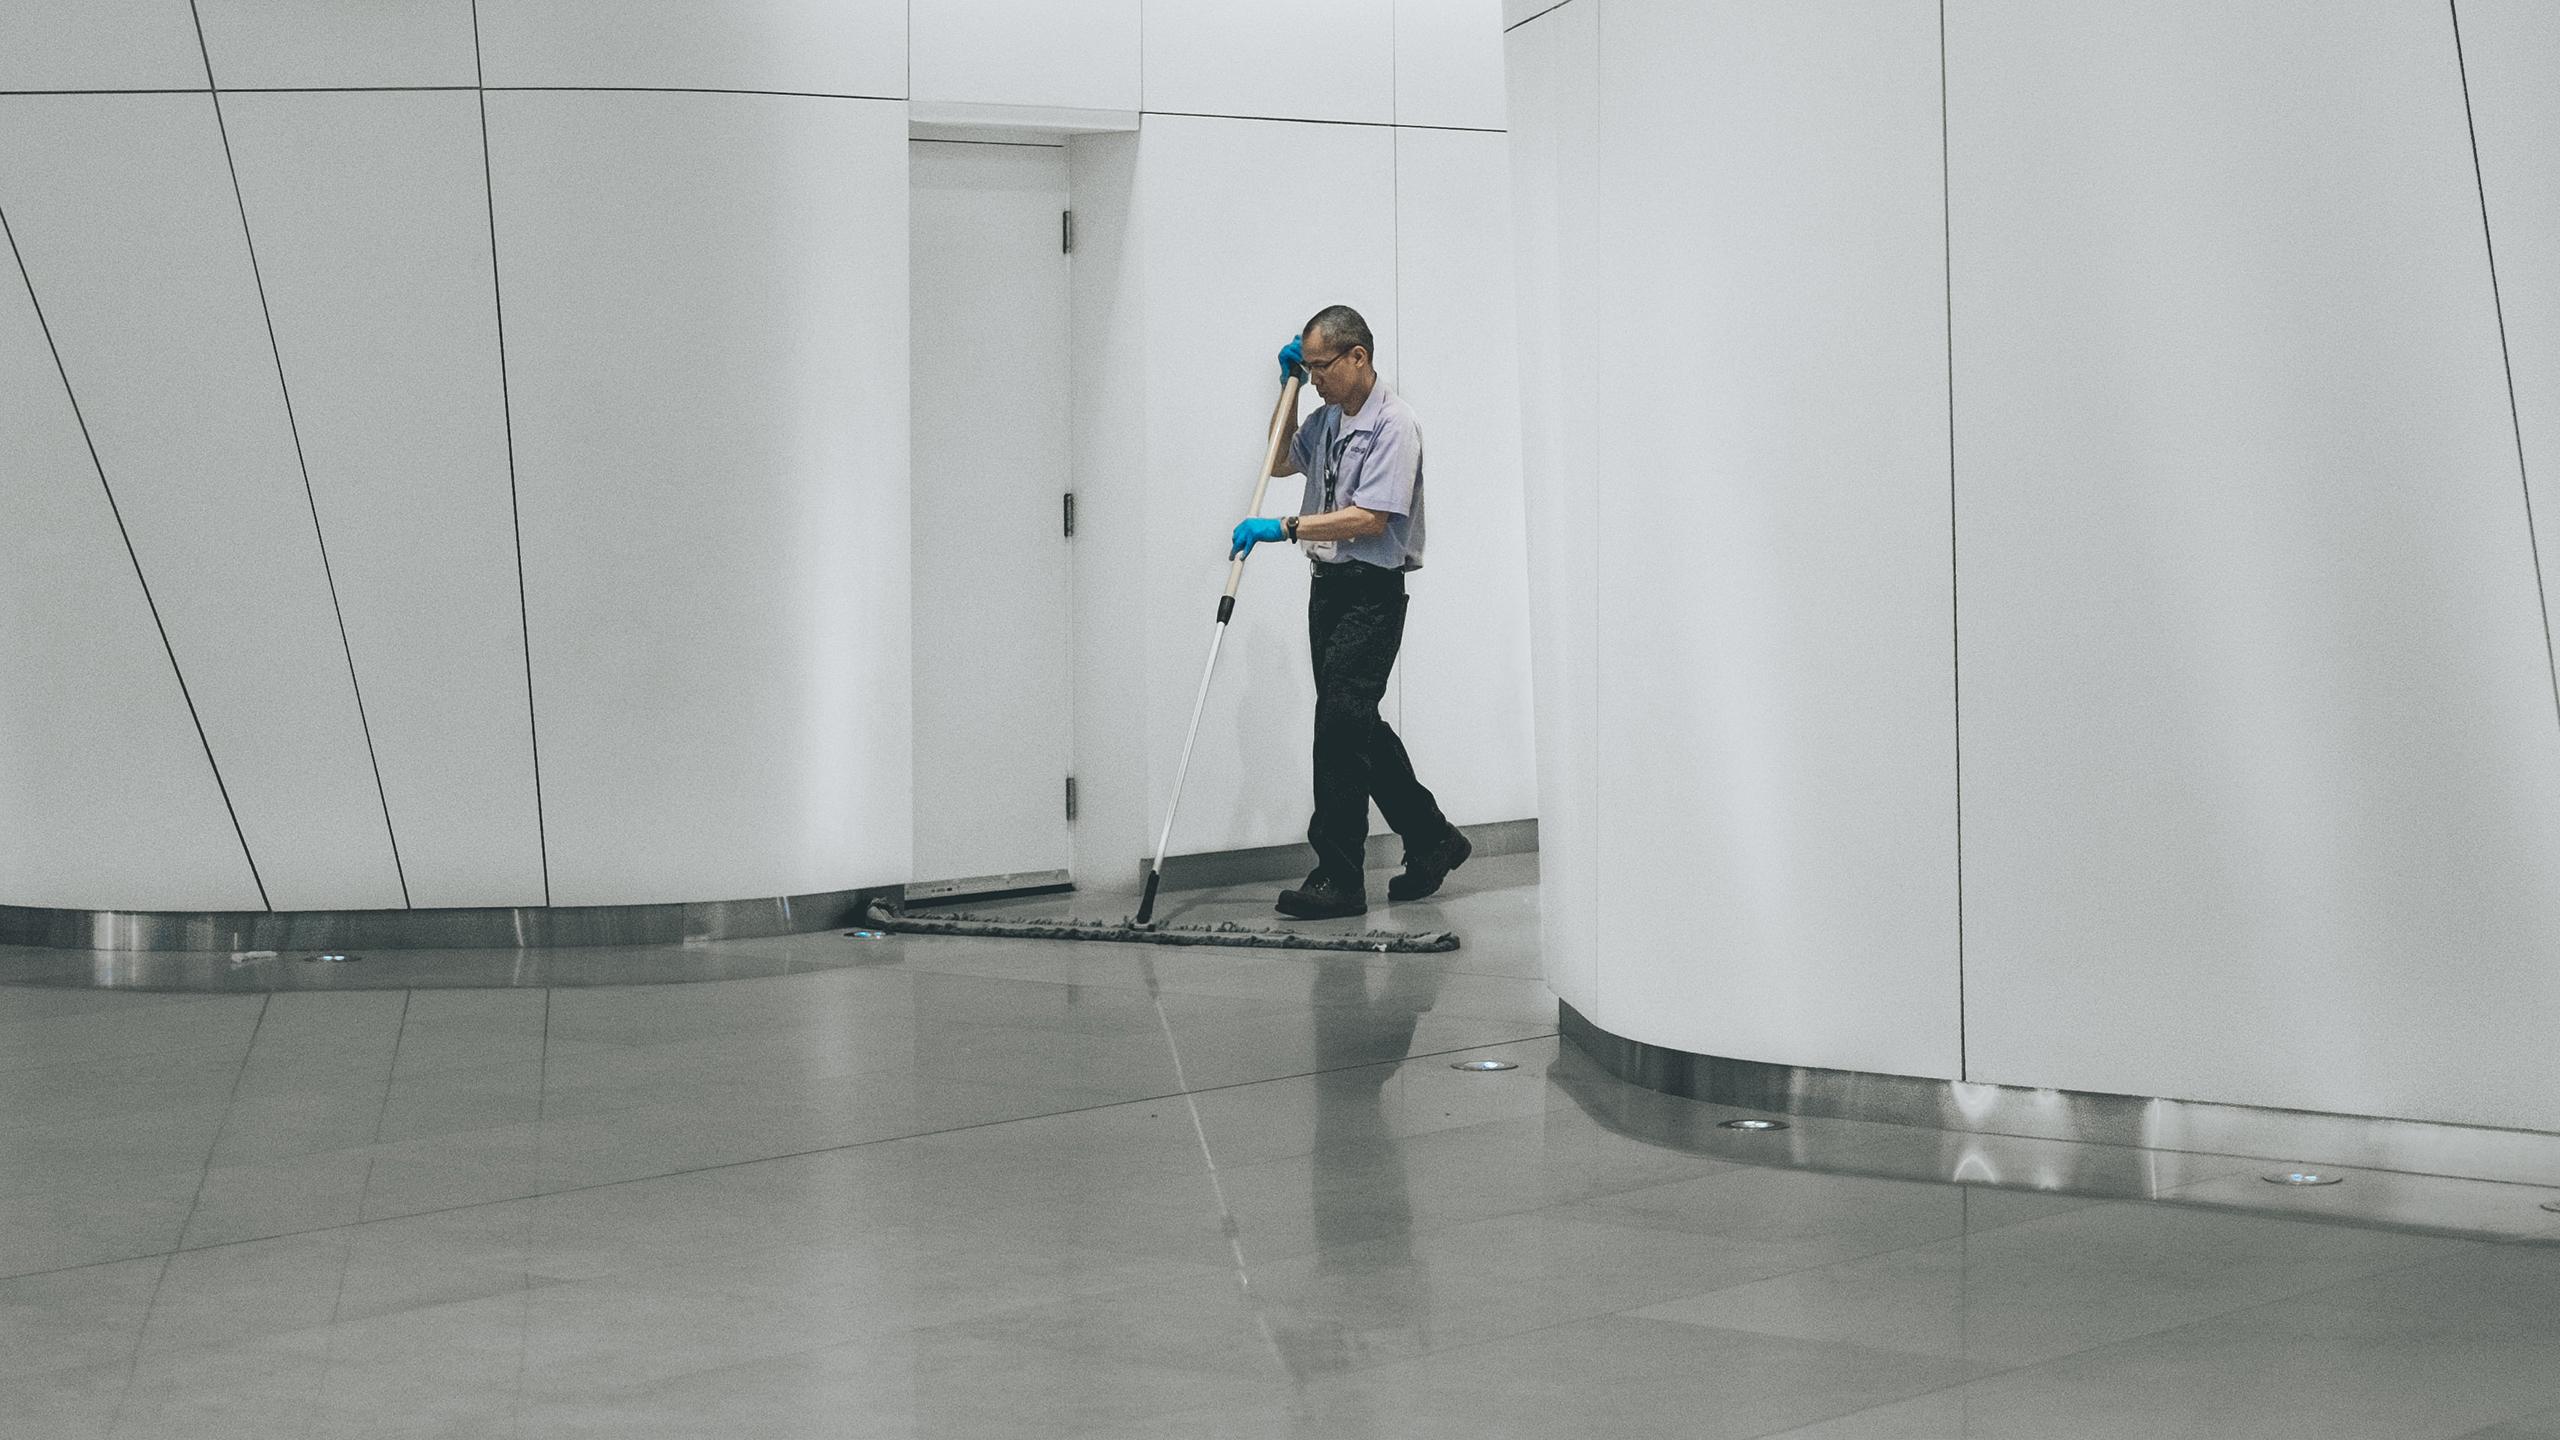 COVID-19 Services | Hygiene Stewards